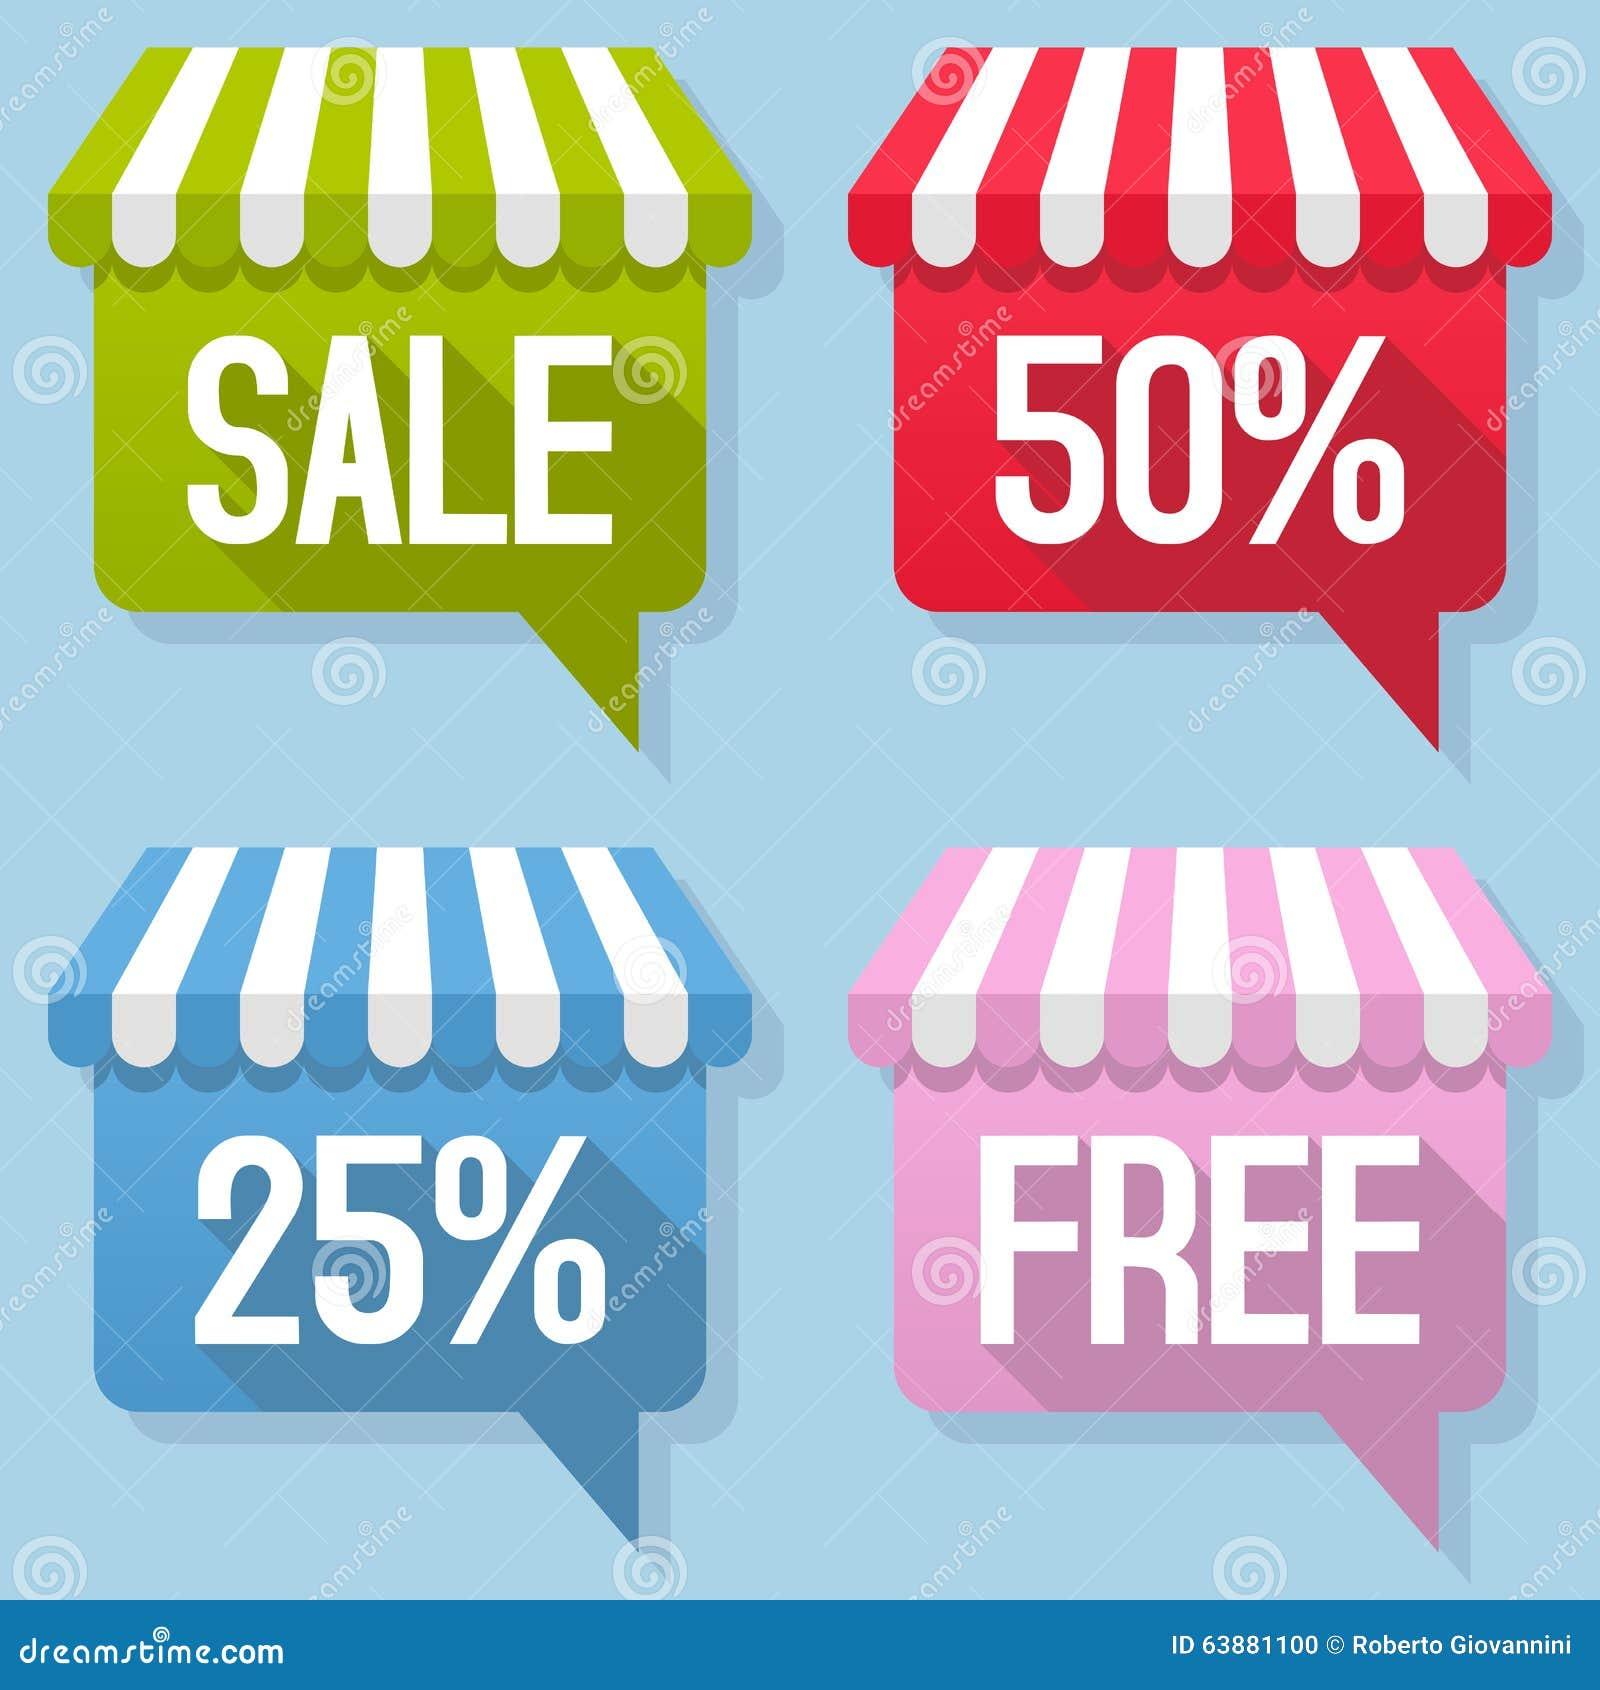 Awning ελεύθερο σύνολο πώλησης λεκτικών φυσαλίδων